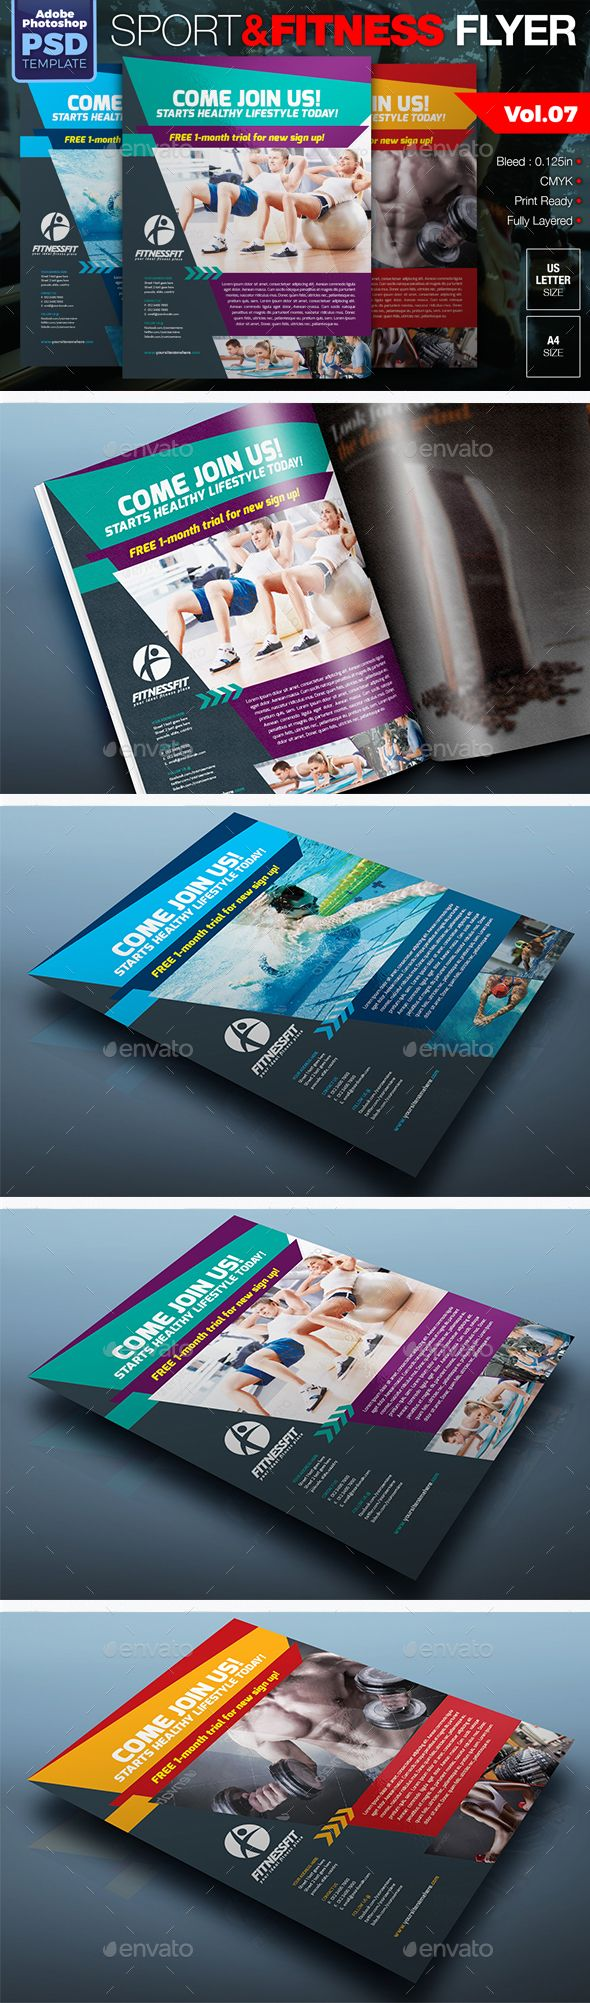 design flyers free